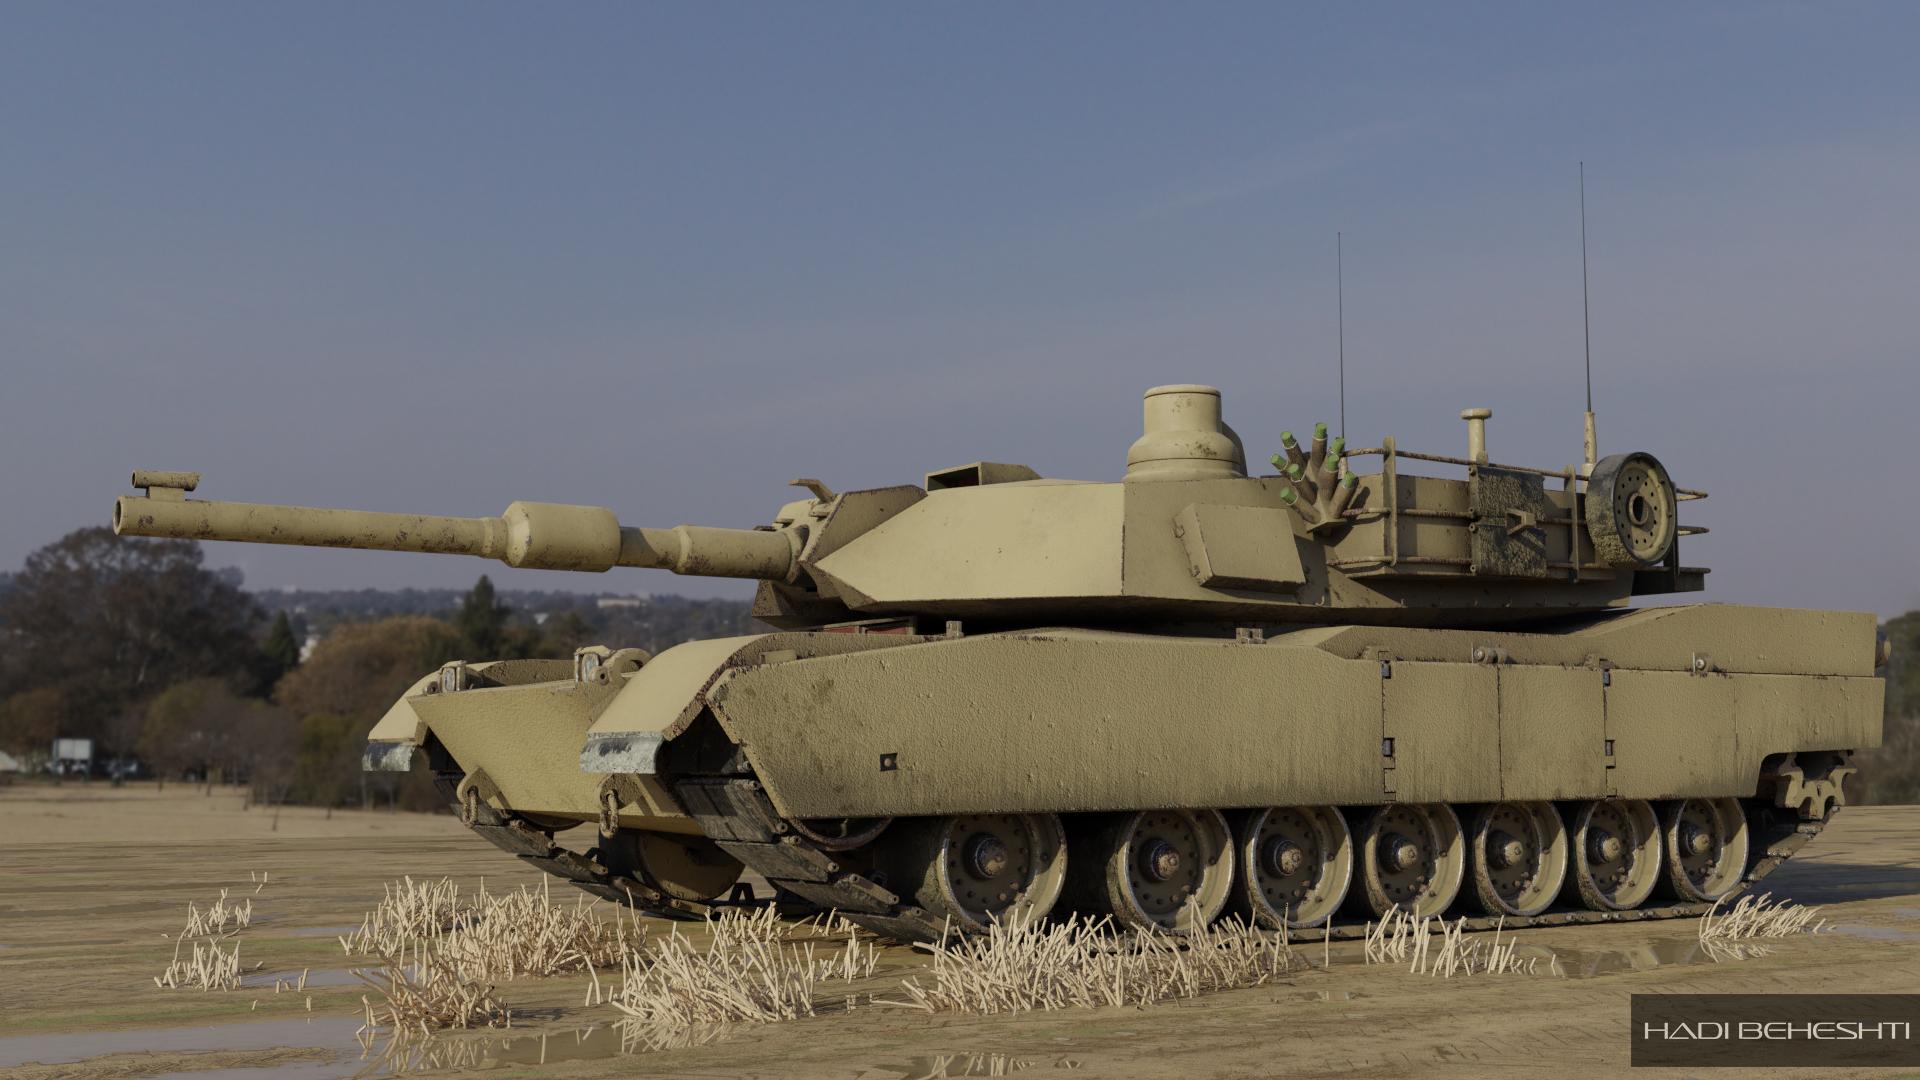 TankBlender_1 by Hadi Beheshti